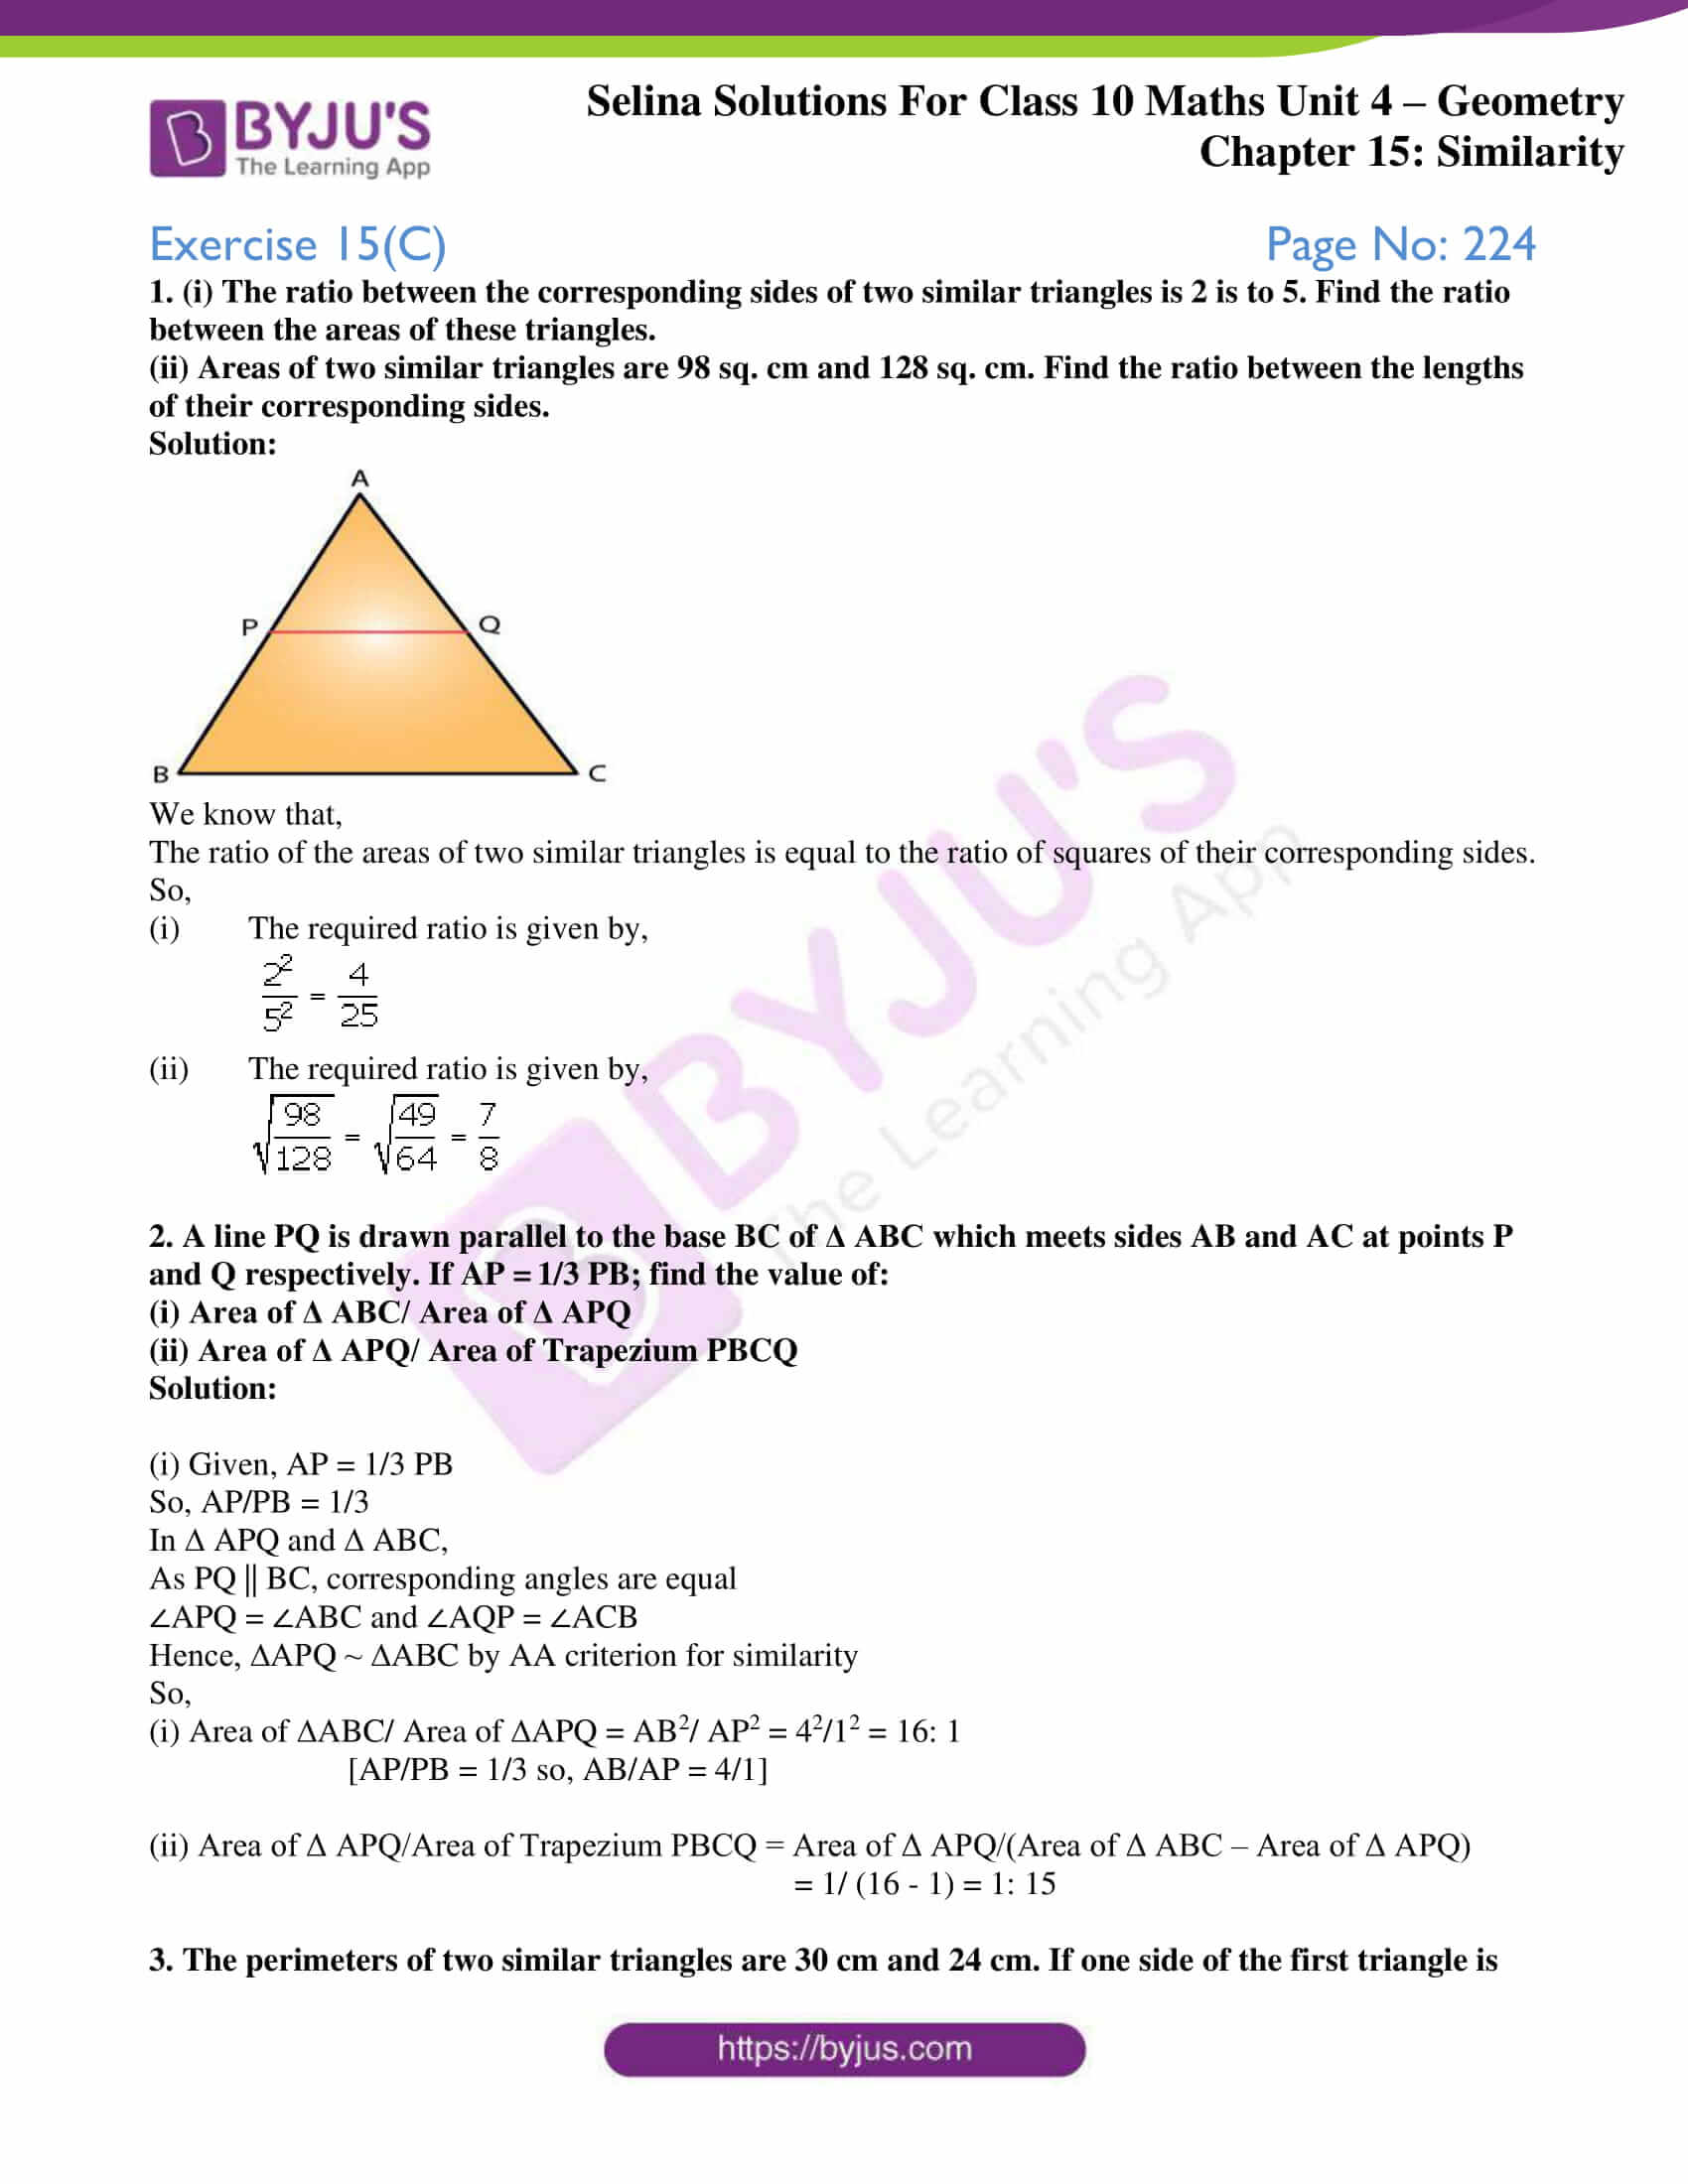 selina-sol-maths-class-10-ch-15-ex-c-1